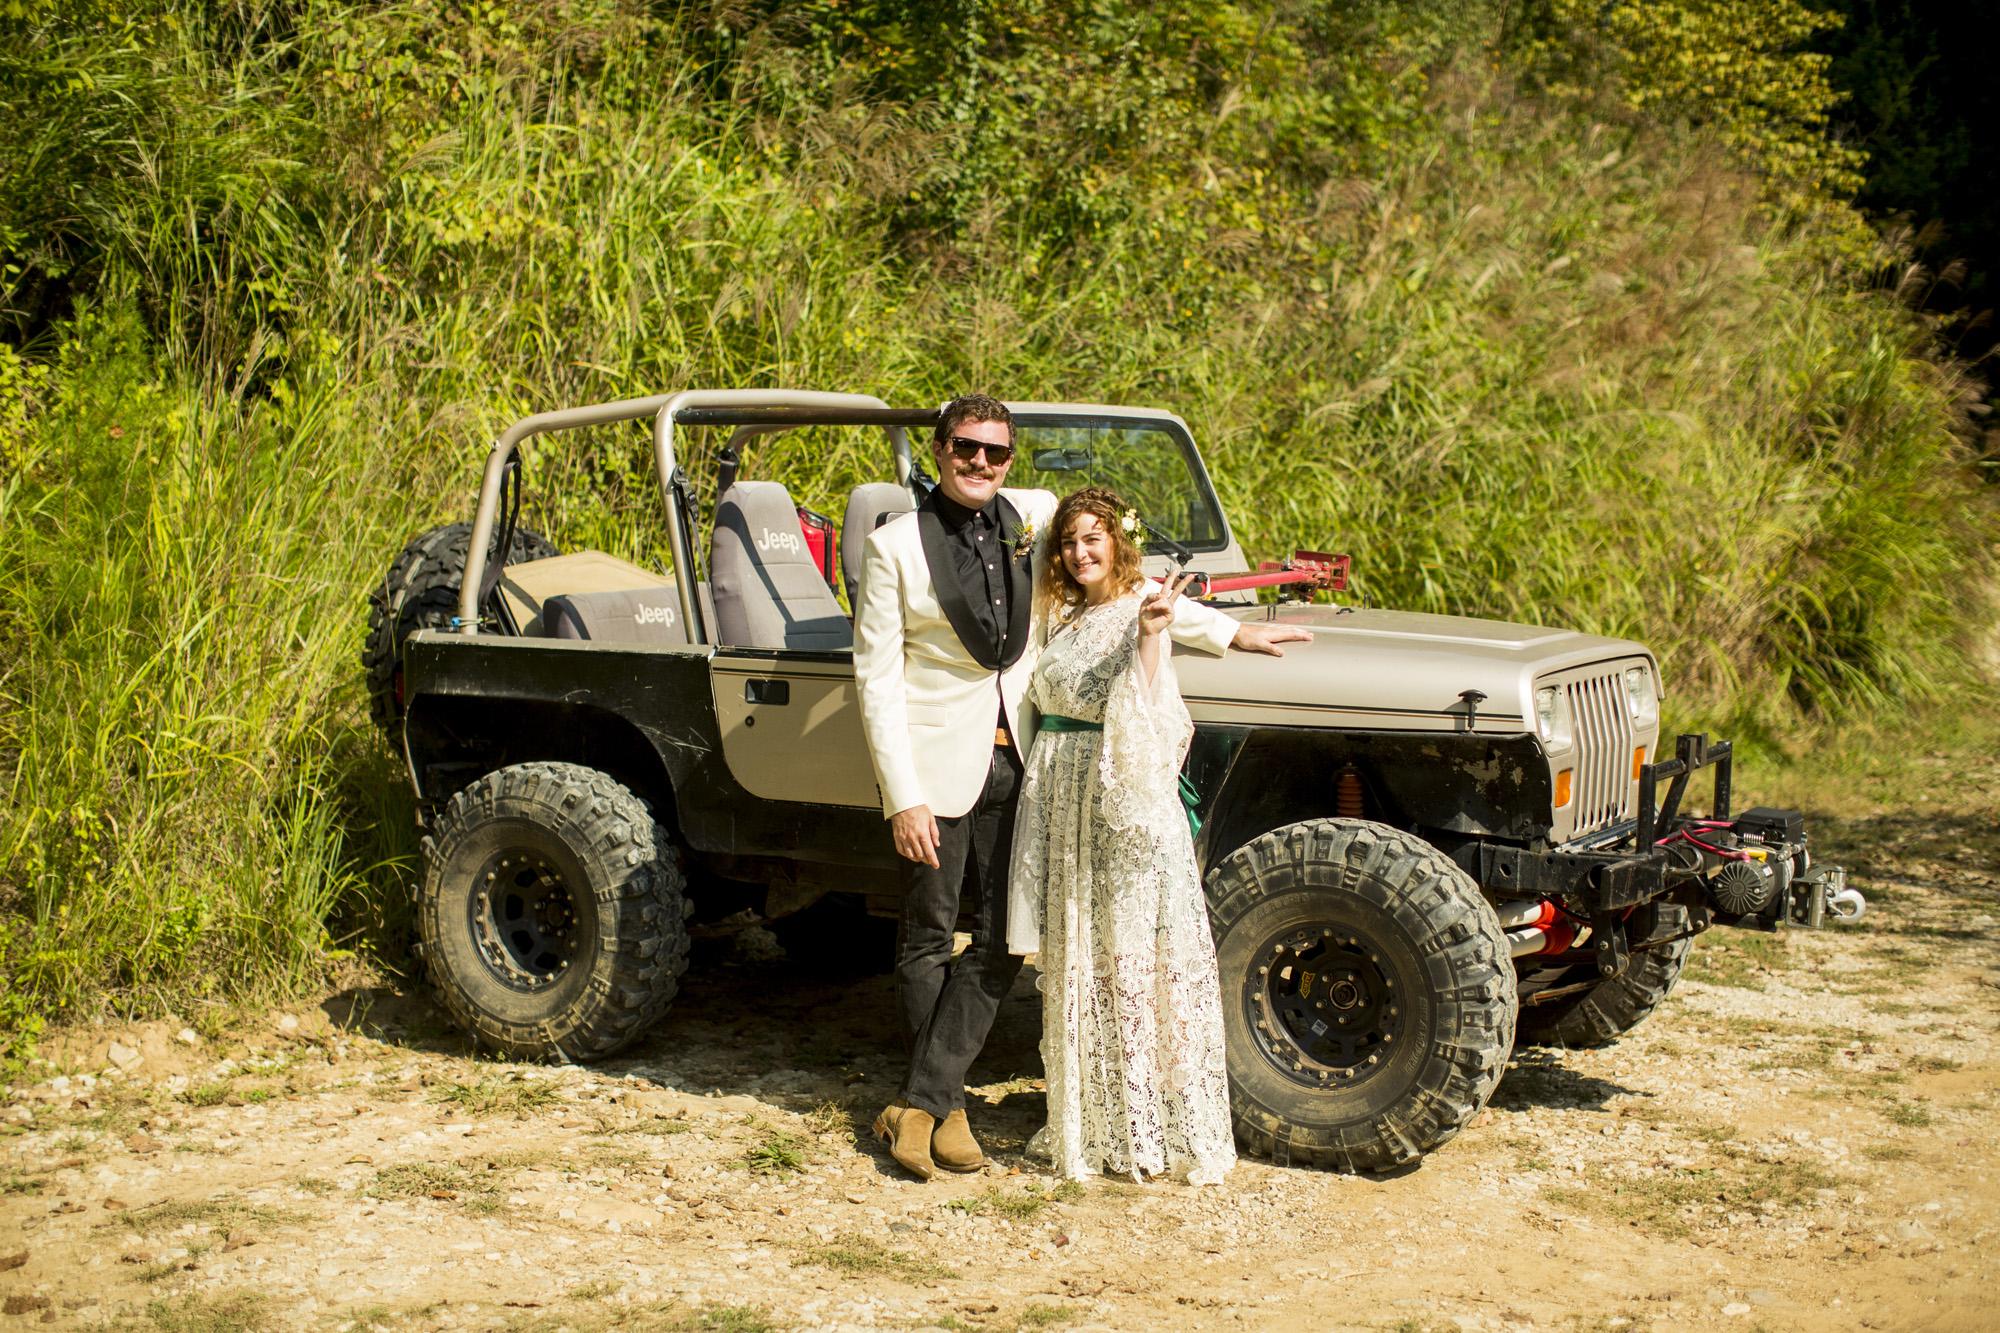 Seriously_Sabrina_Photography_Red_River_Gorge_Kentucky_Wedding_ShawnDana95.jpg